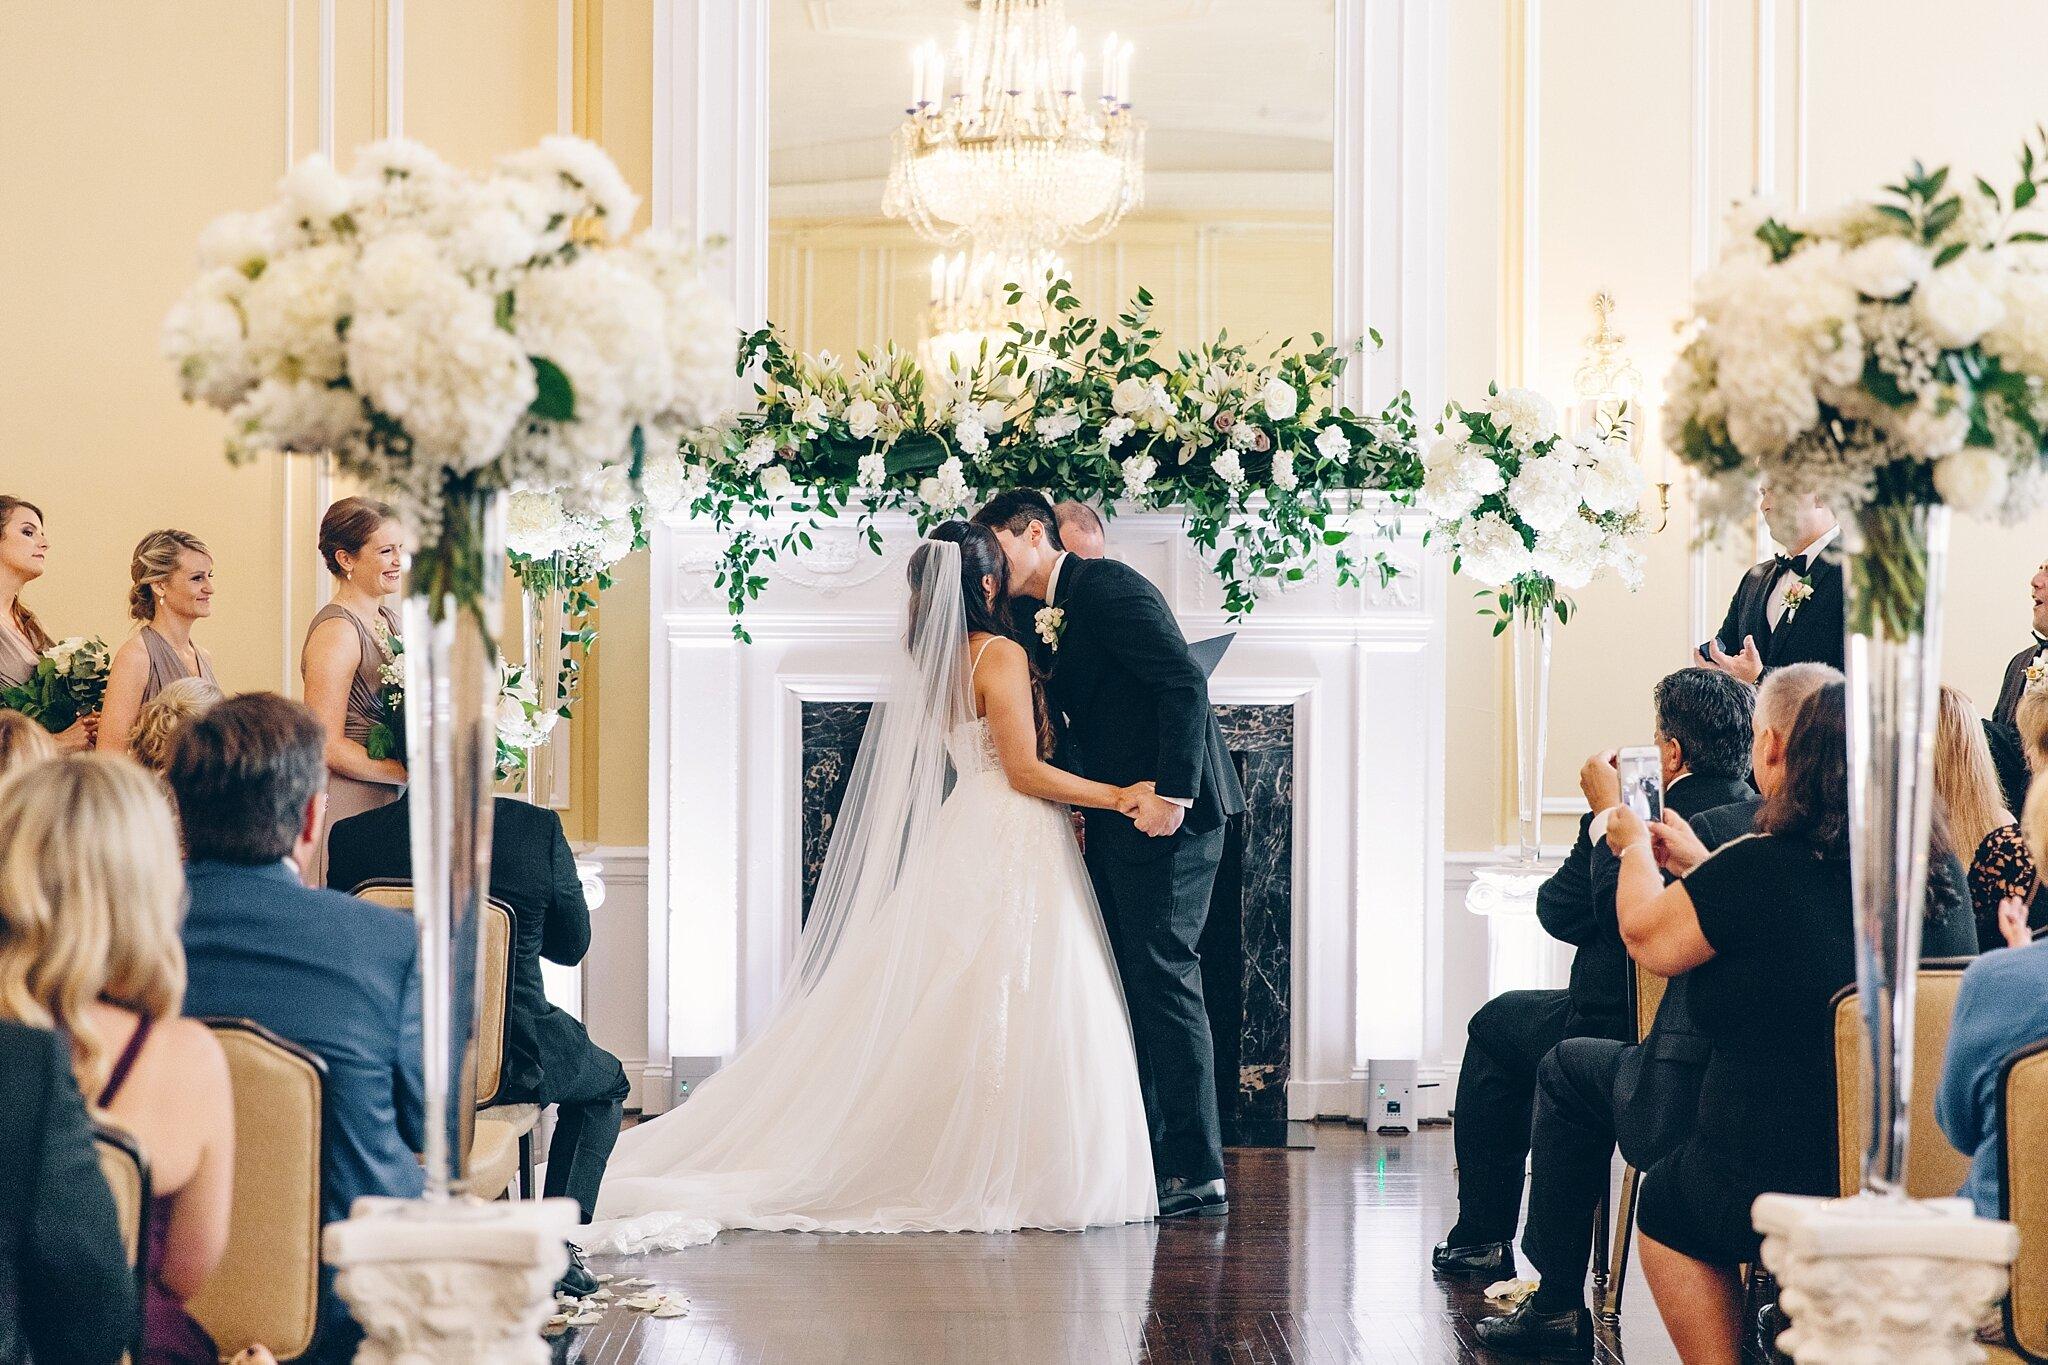 patrick-henry-ballroom-wedding-roanoke_0498.jpg